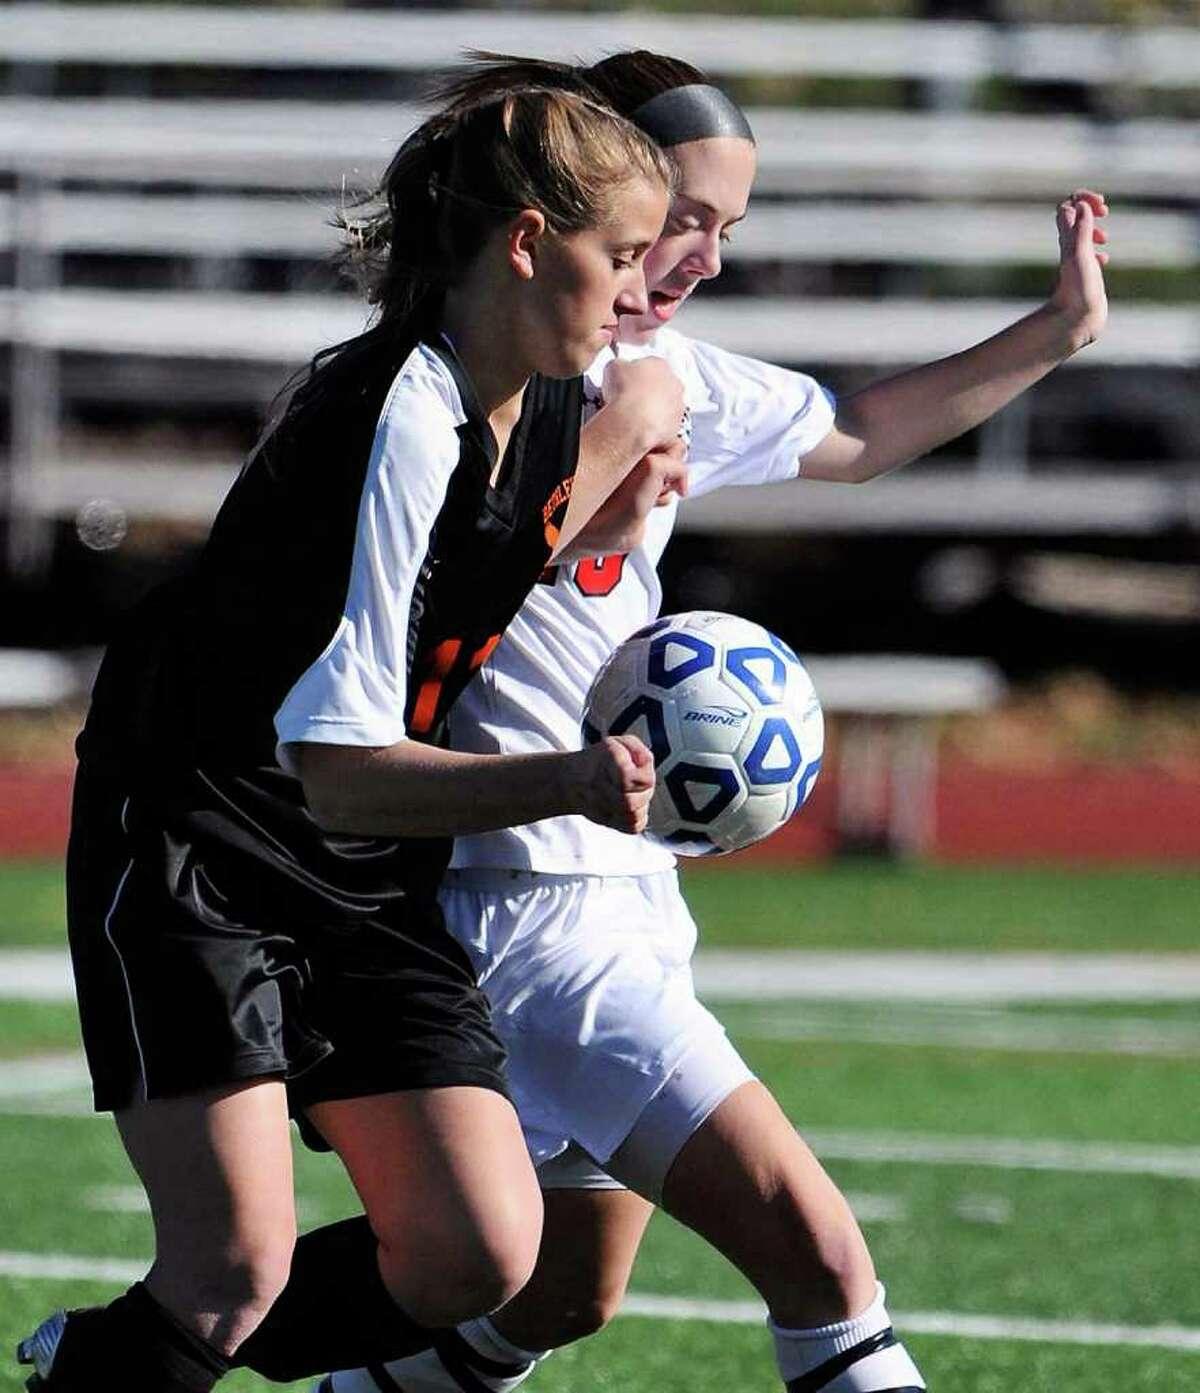 High school soccer -- Baldwinsville's Clair Monnat, in back, battles for the ball against Bethlehem's Tara Teal. (Nicholas Lisi / The Post-Standard)